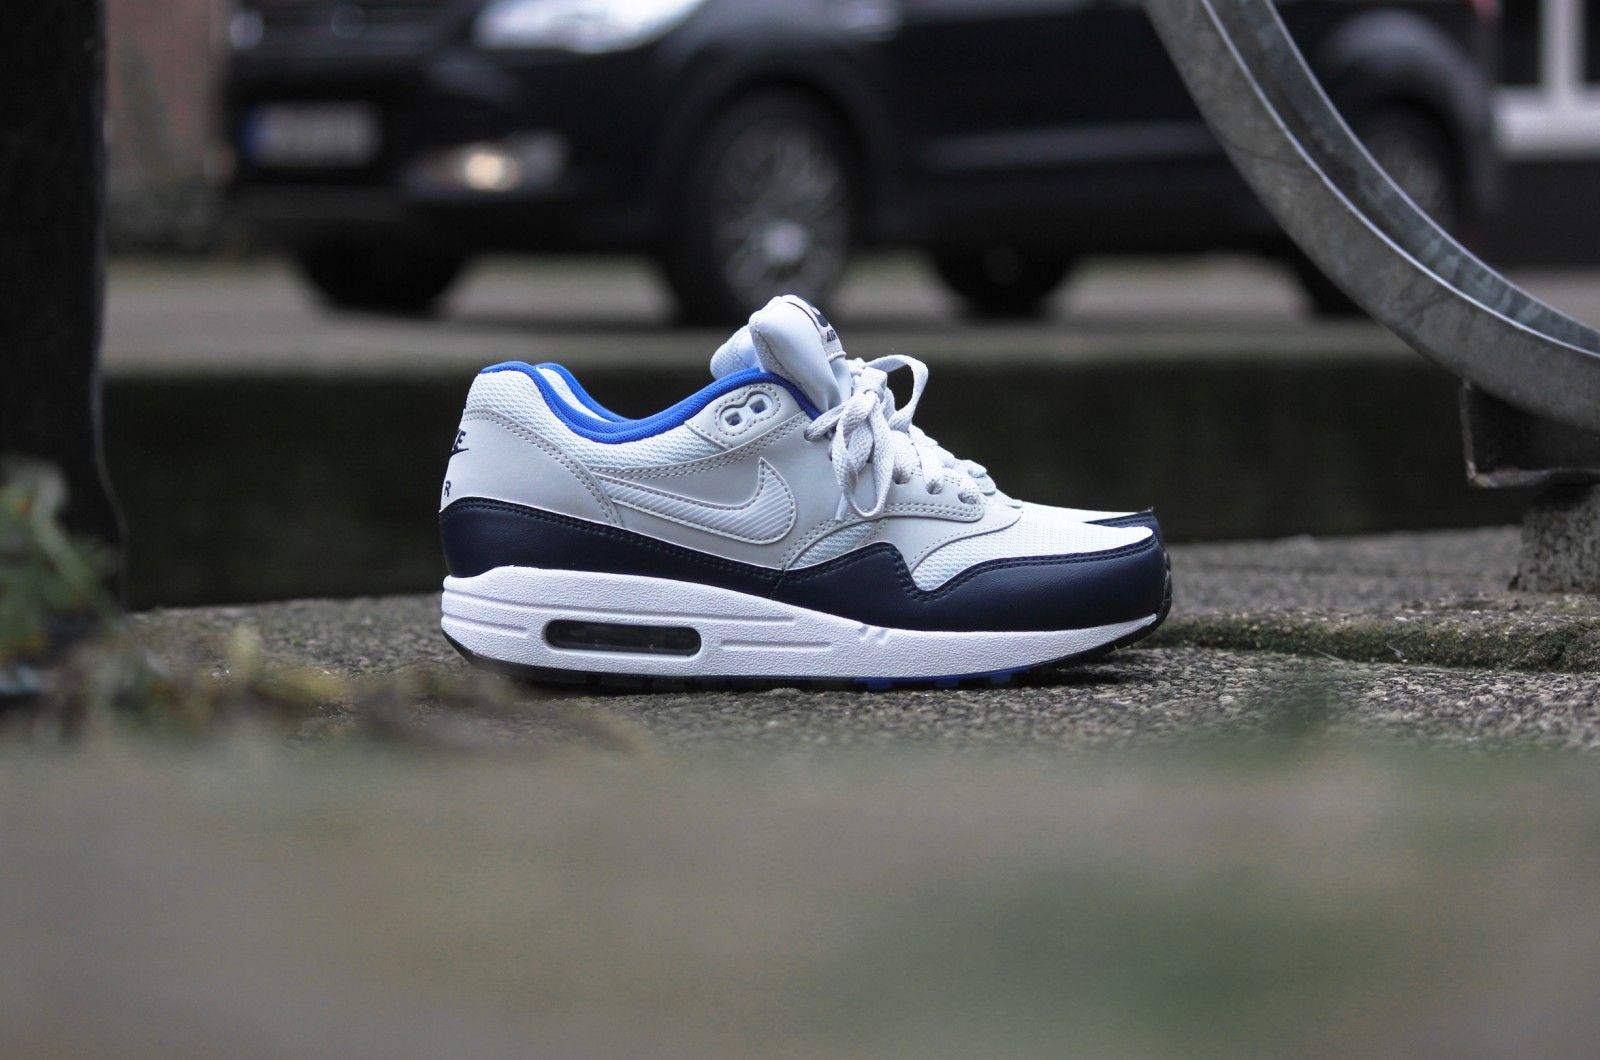 93a93f04ba Nike Air Max 1 Essential Pure Platinum / Mid Navy - 537383-023 ...